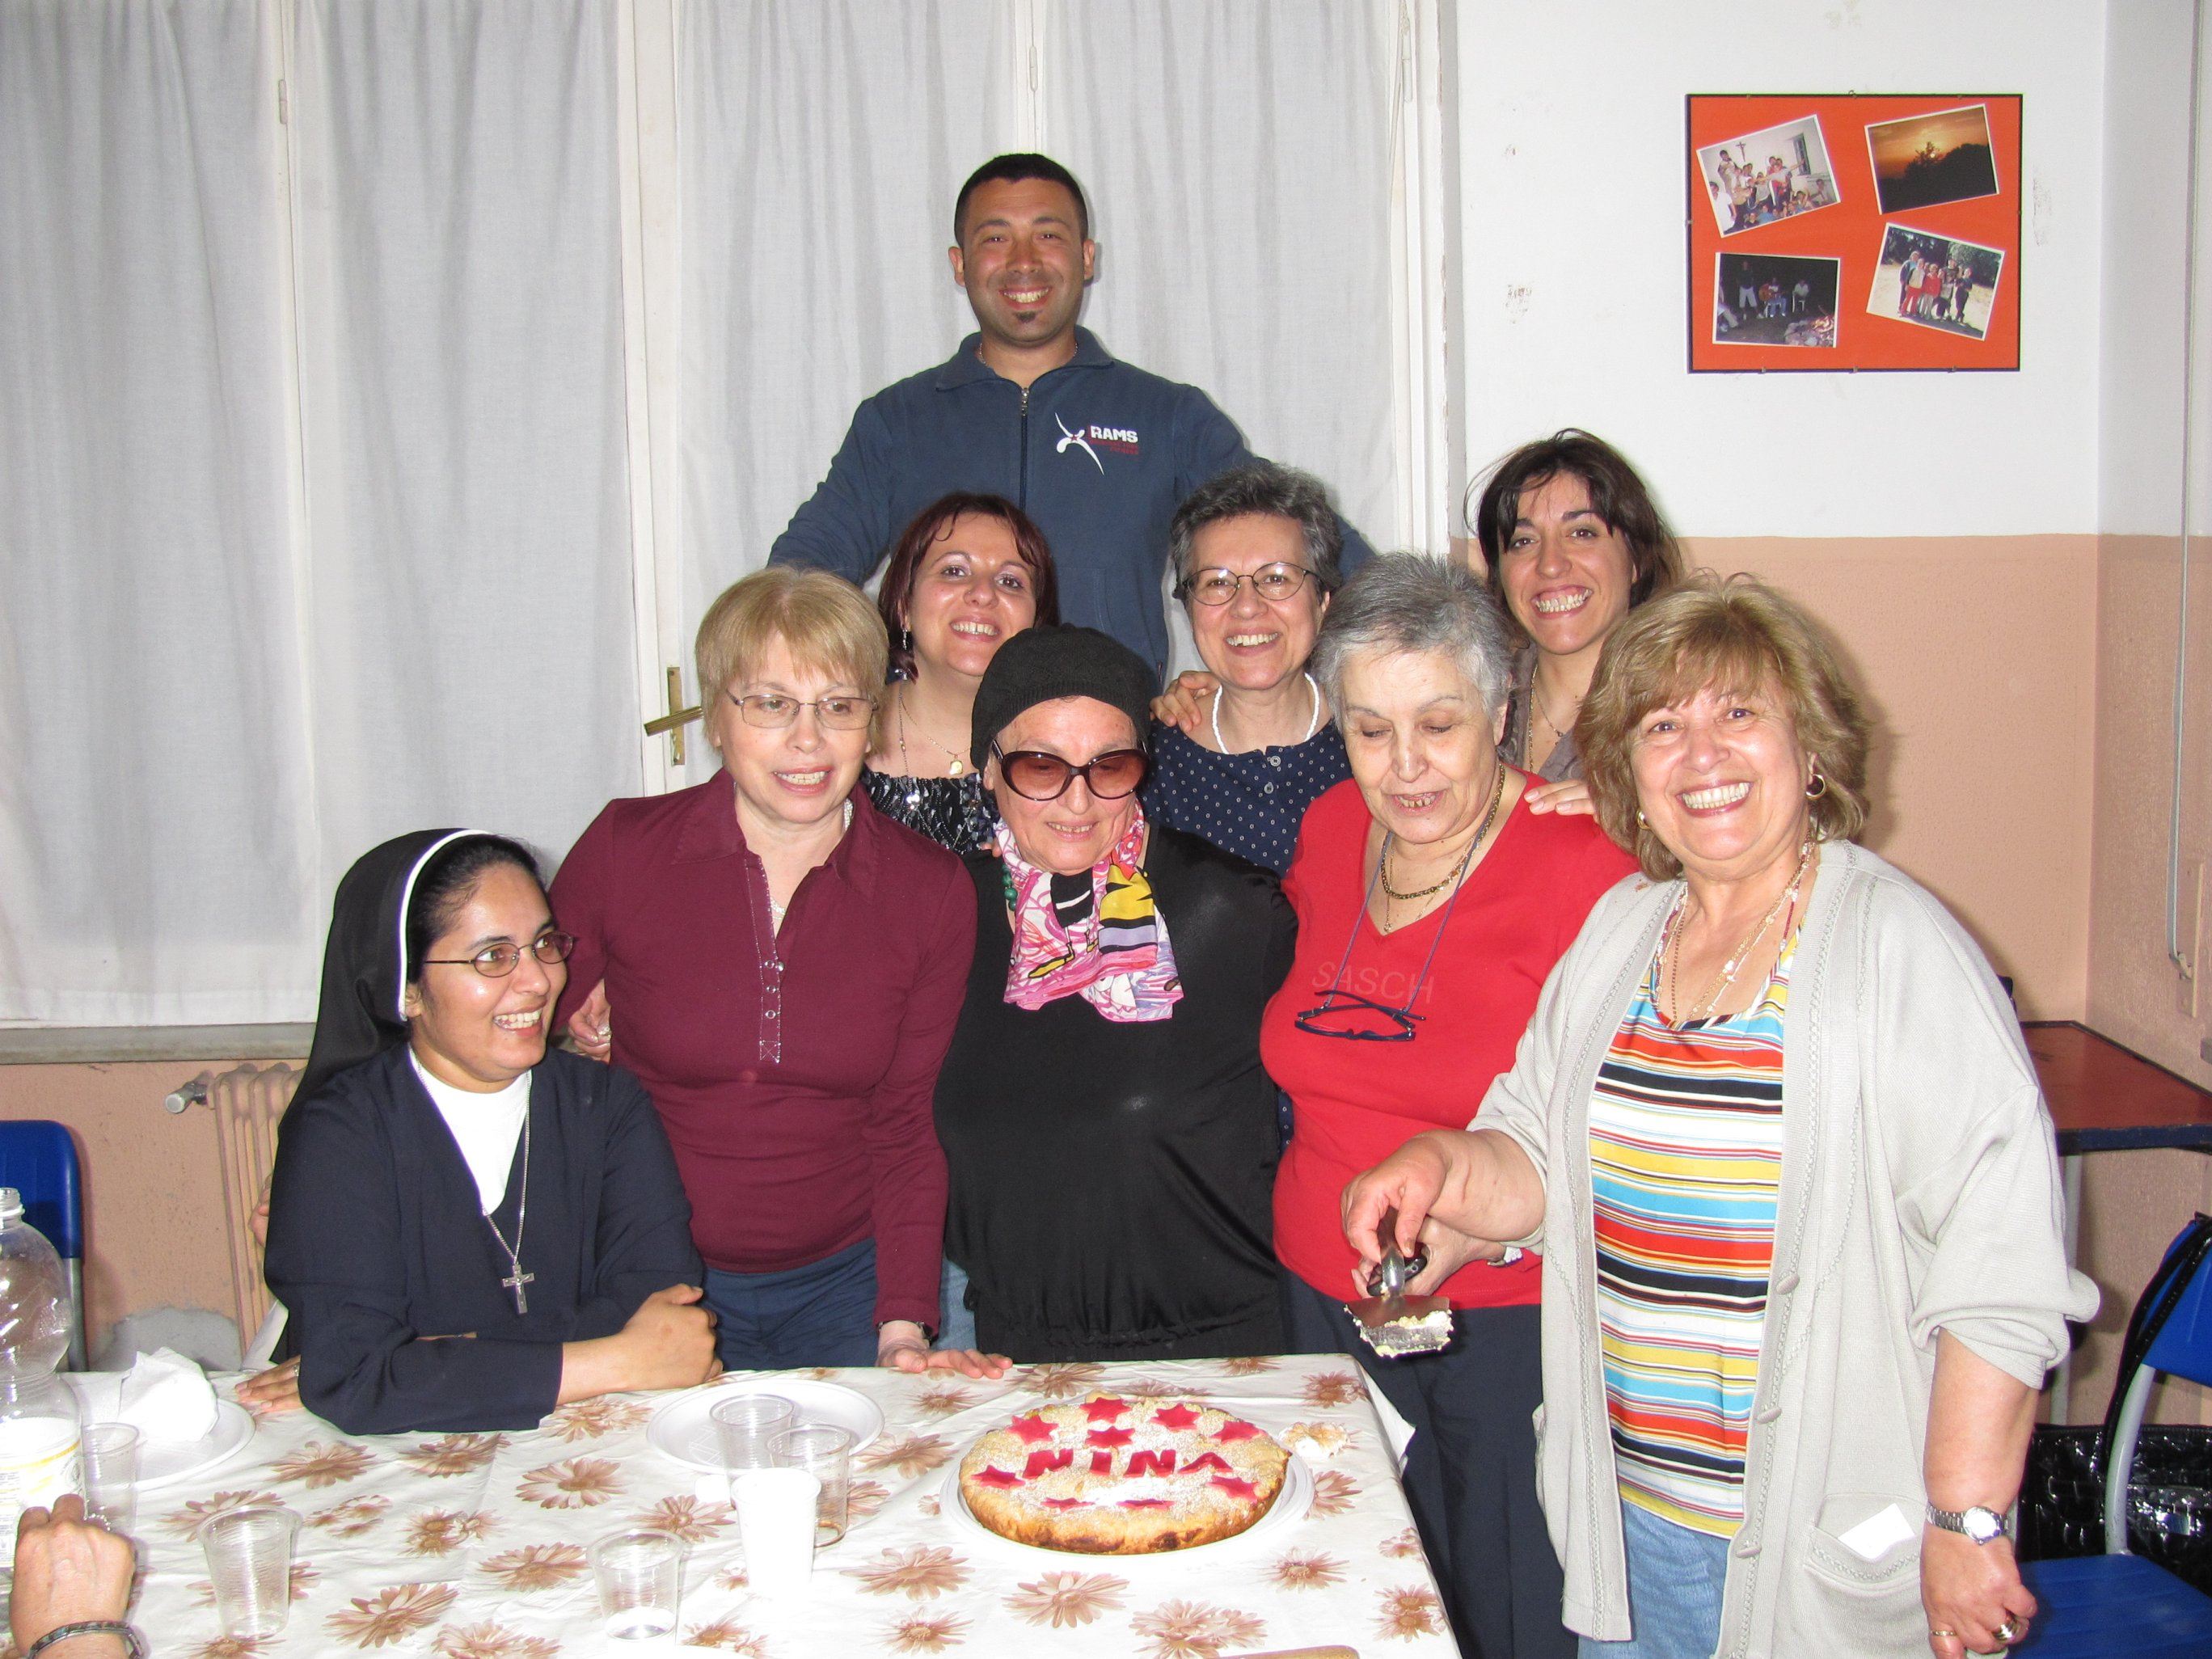 verifica_catechiste_2012-06-11-19-50-34